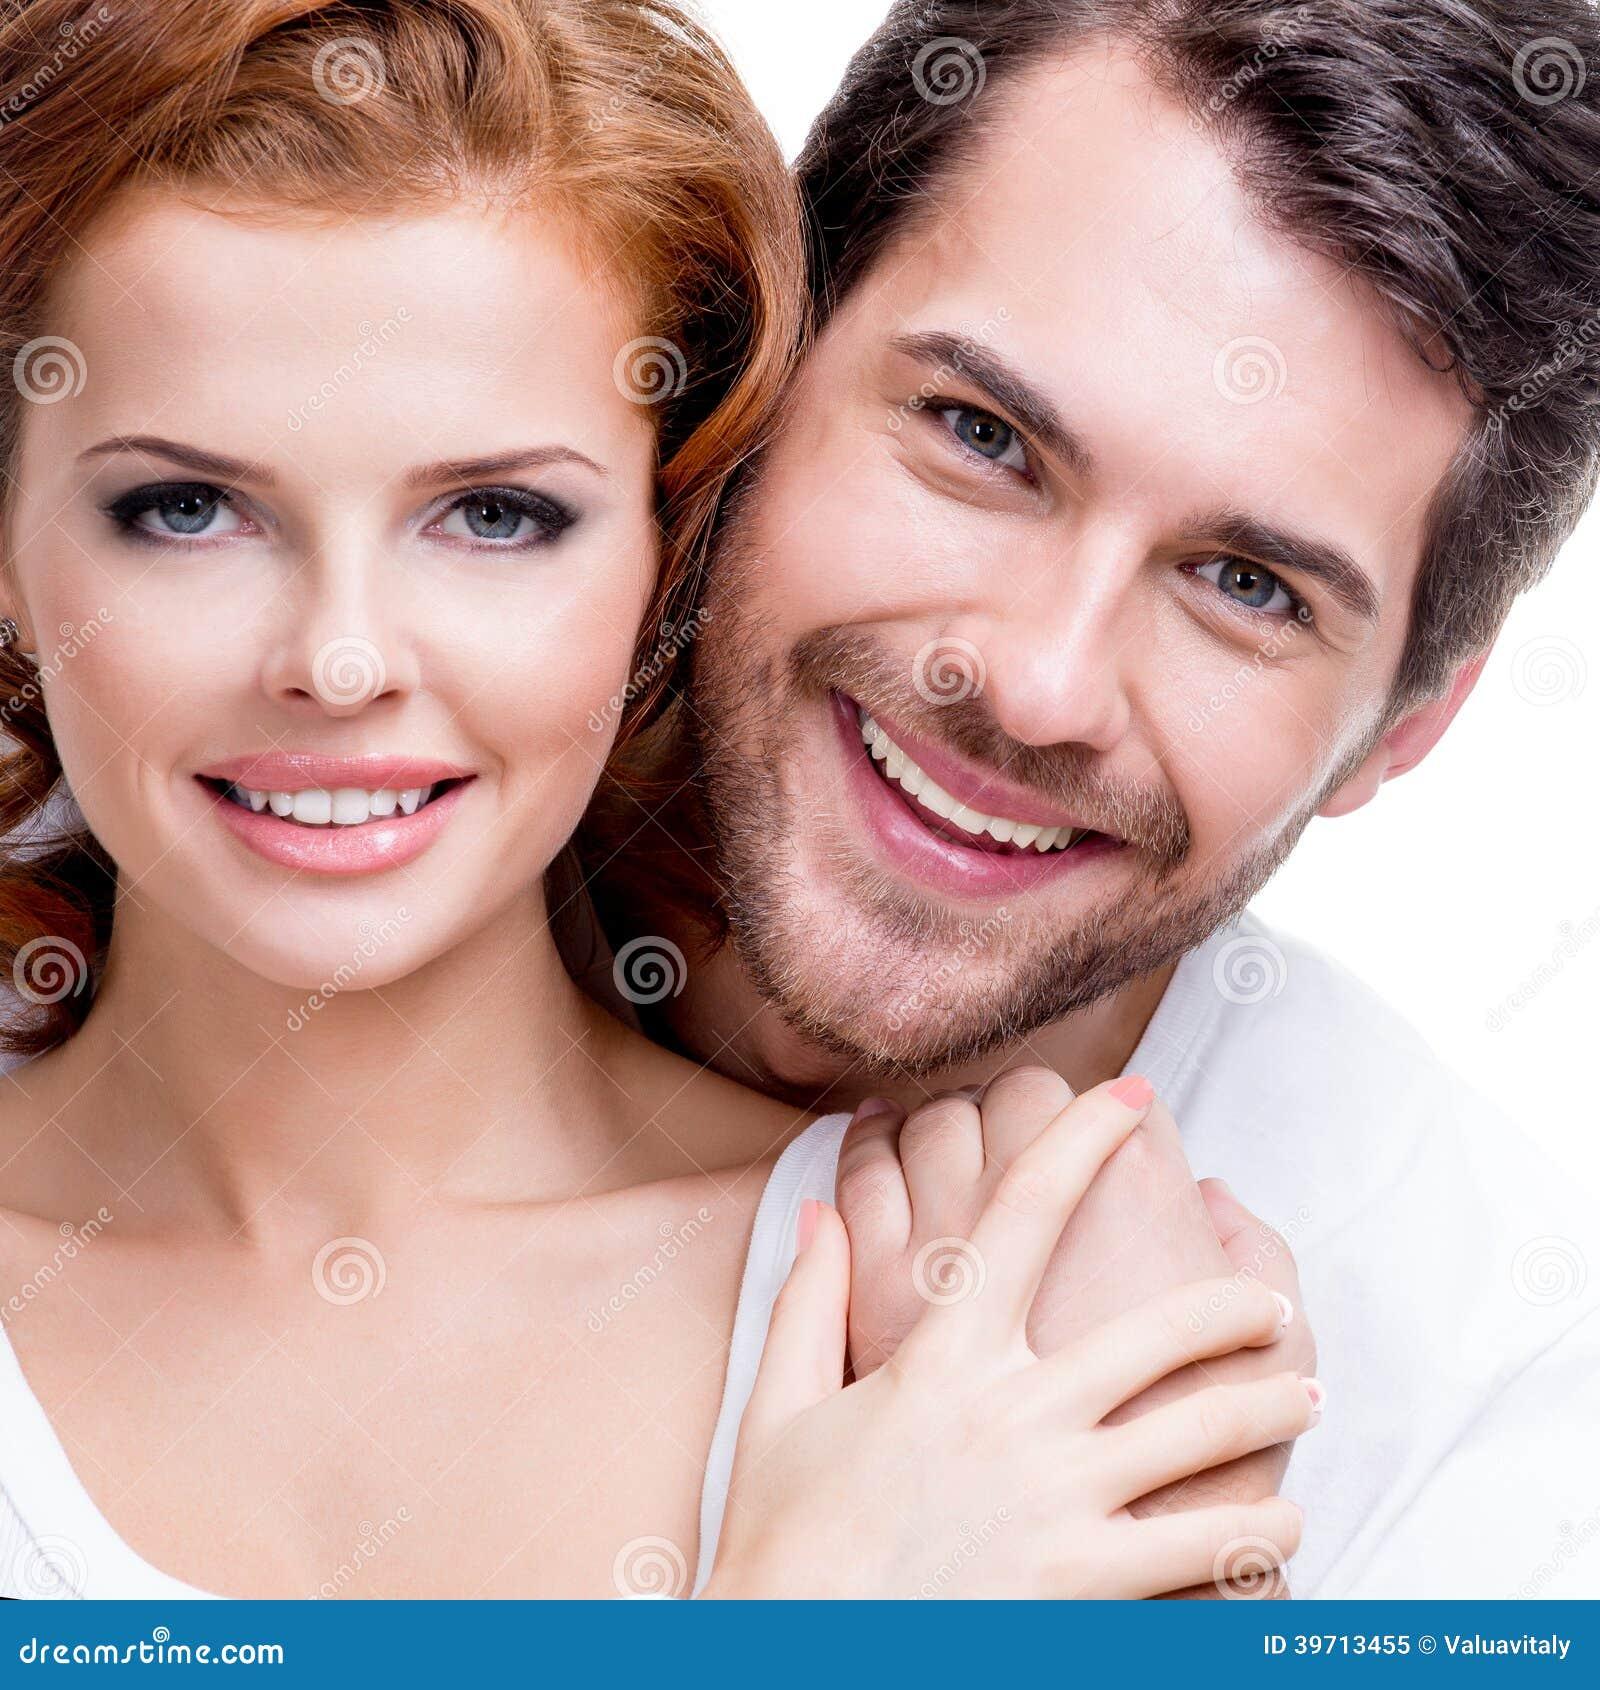 Closeup Portrait Of Beautiful Smiling Couple. Stock Image